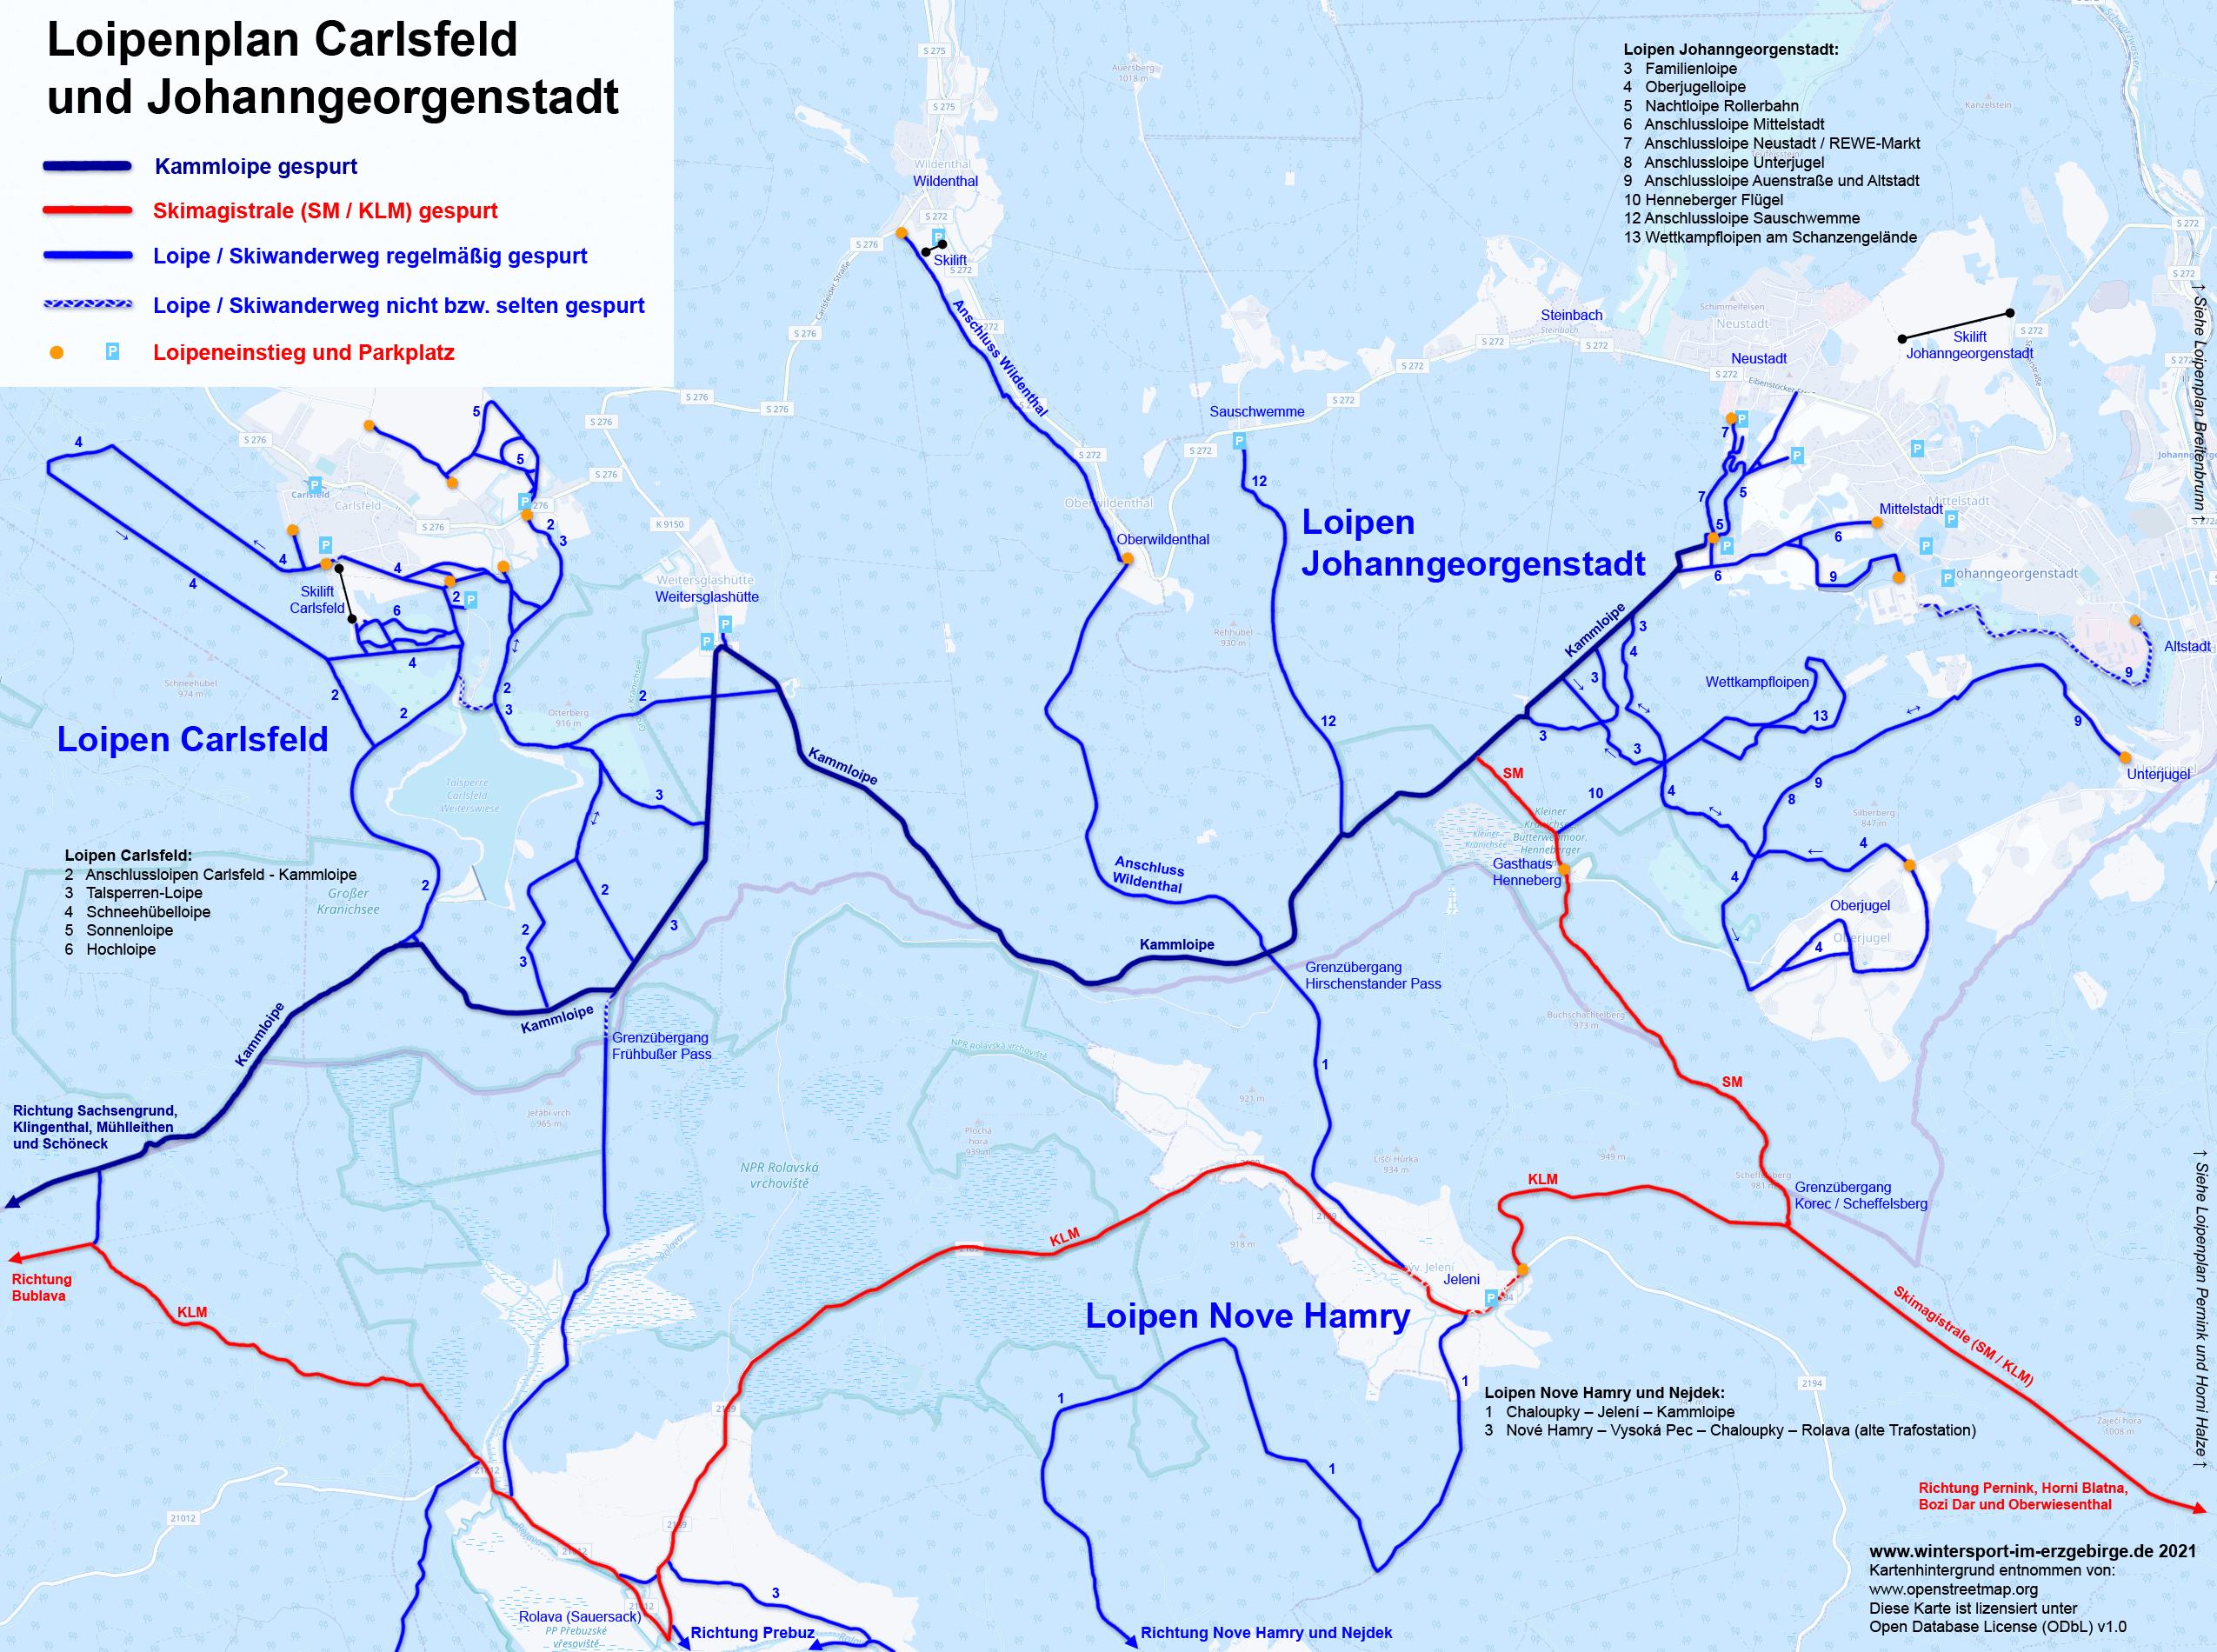 Loipenplan Johanngeorgenstadt und Carlsfeld (Kammloipe)